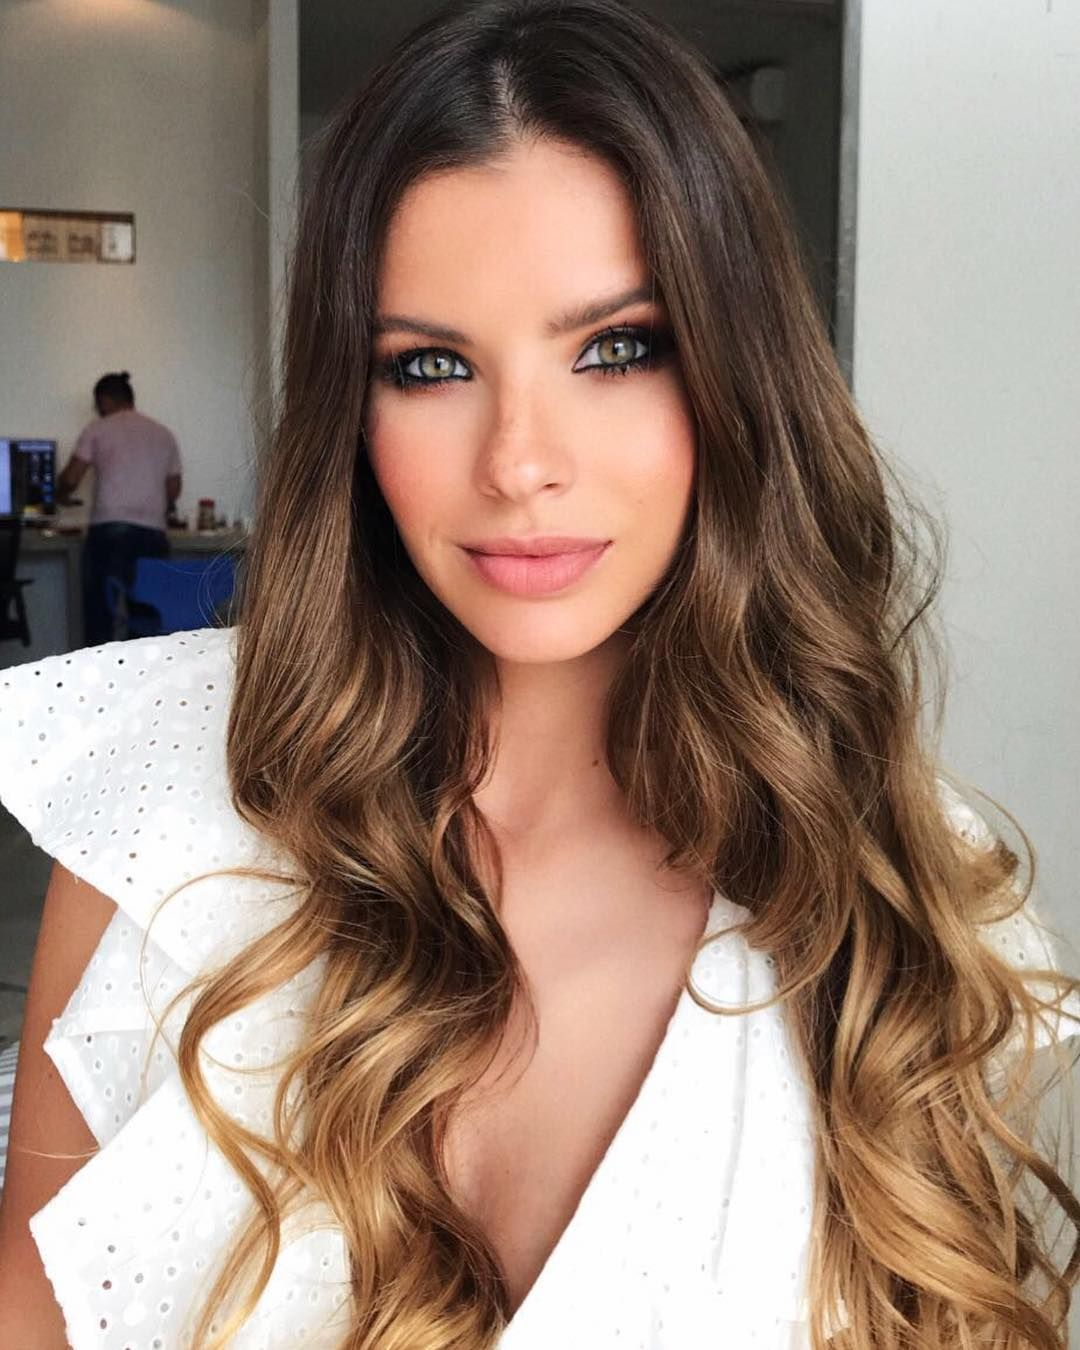 Hacked Maria Eugenia Suarez nudes (29 photos), Tits, Fappening, Instagram, in bikini 2020